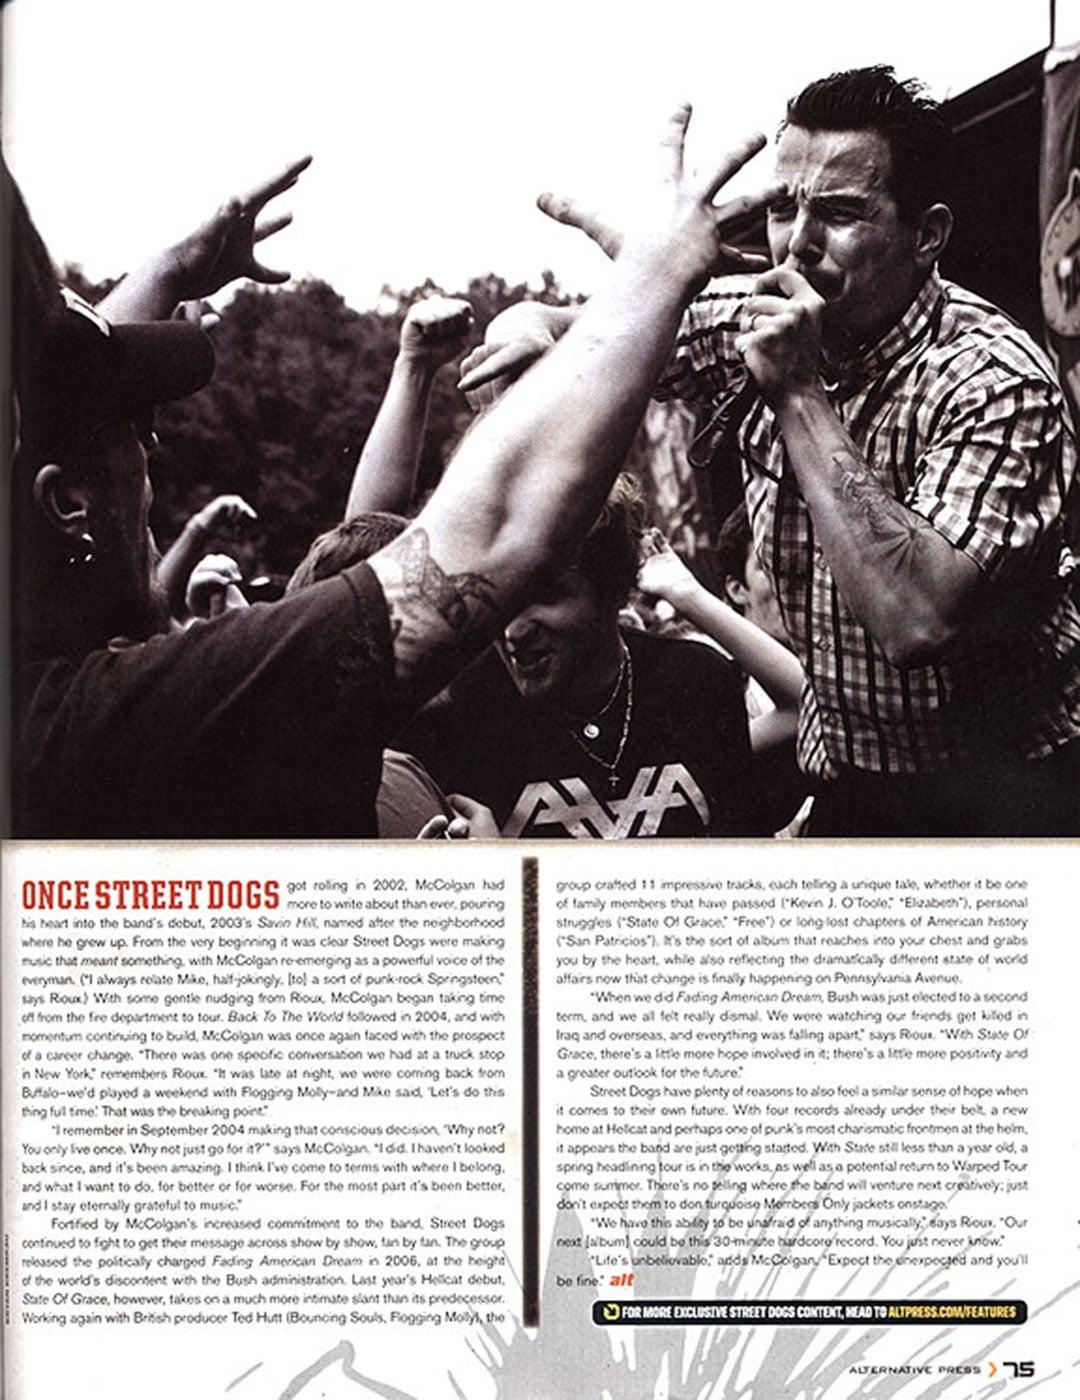 Tearsheets: Alternative Press Magazine - Street Dogs